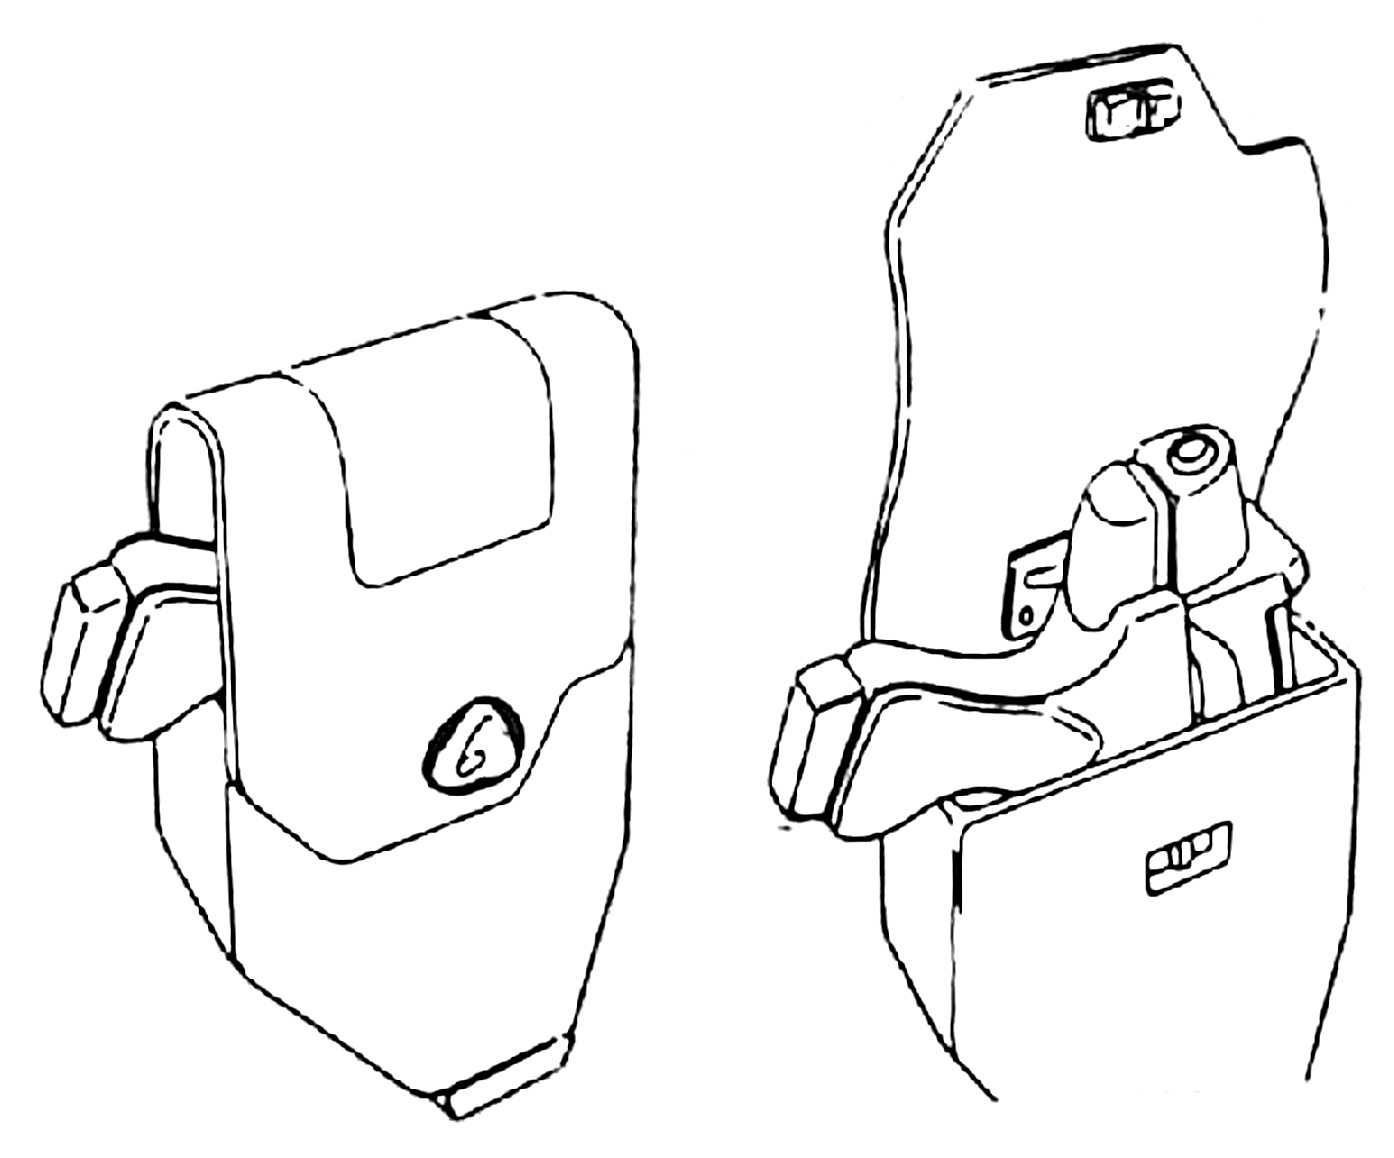 North American Arms Derringer Pistol | Wiring Diagram Database